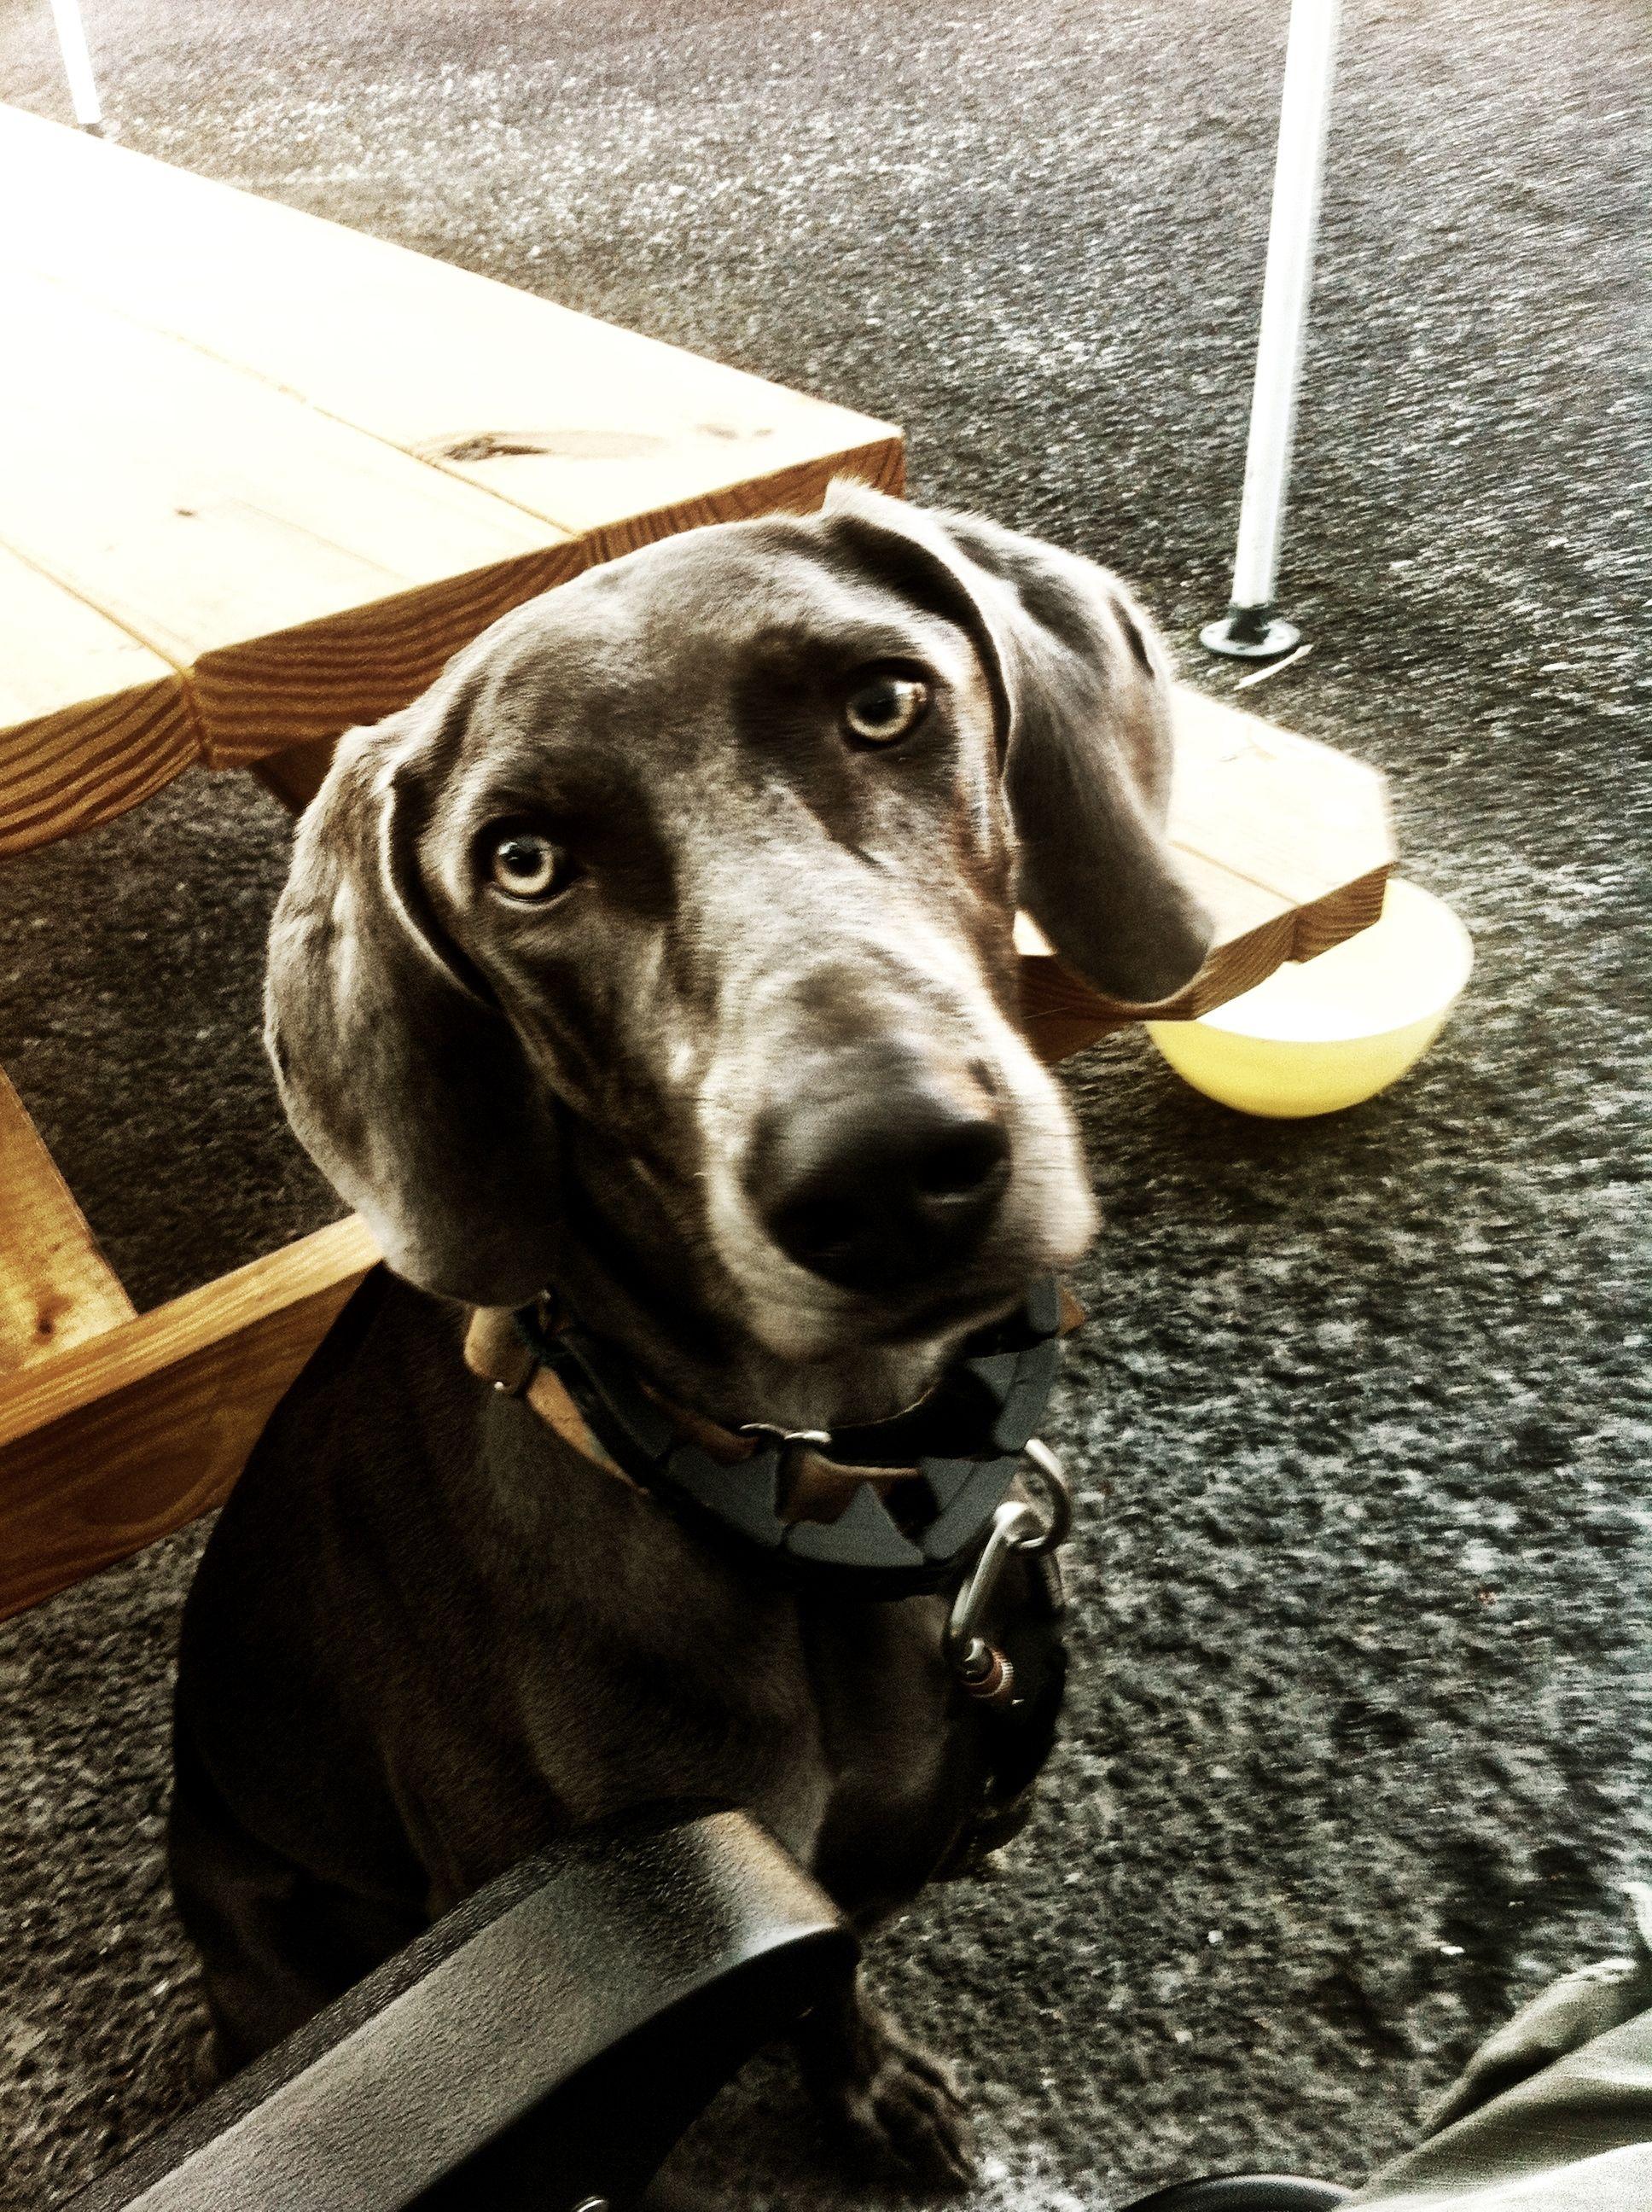 New Blue Weim family member Indy! Dog lovers, Weimaraner